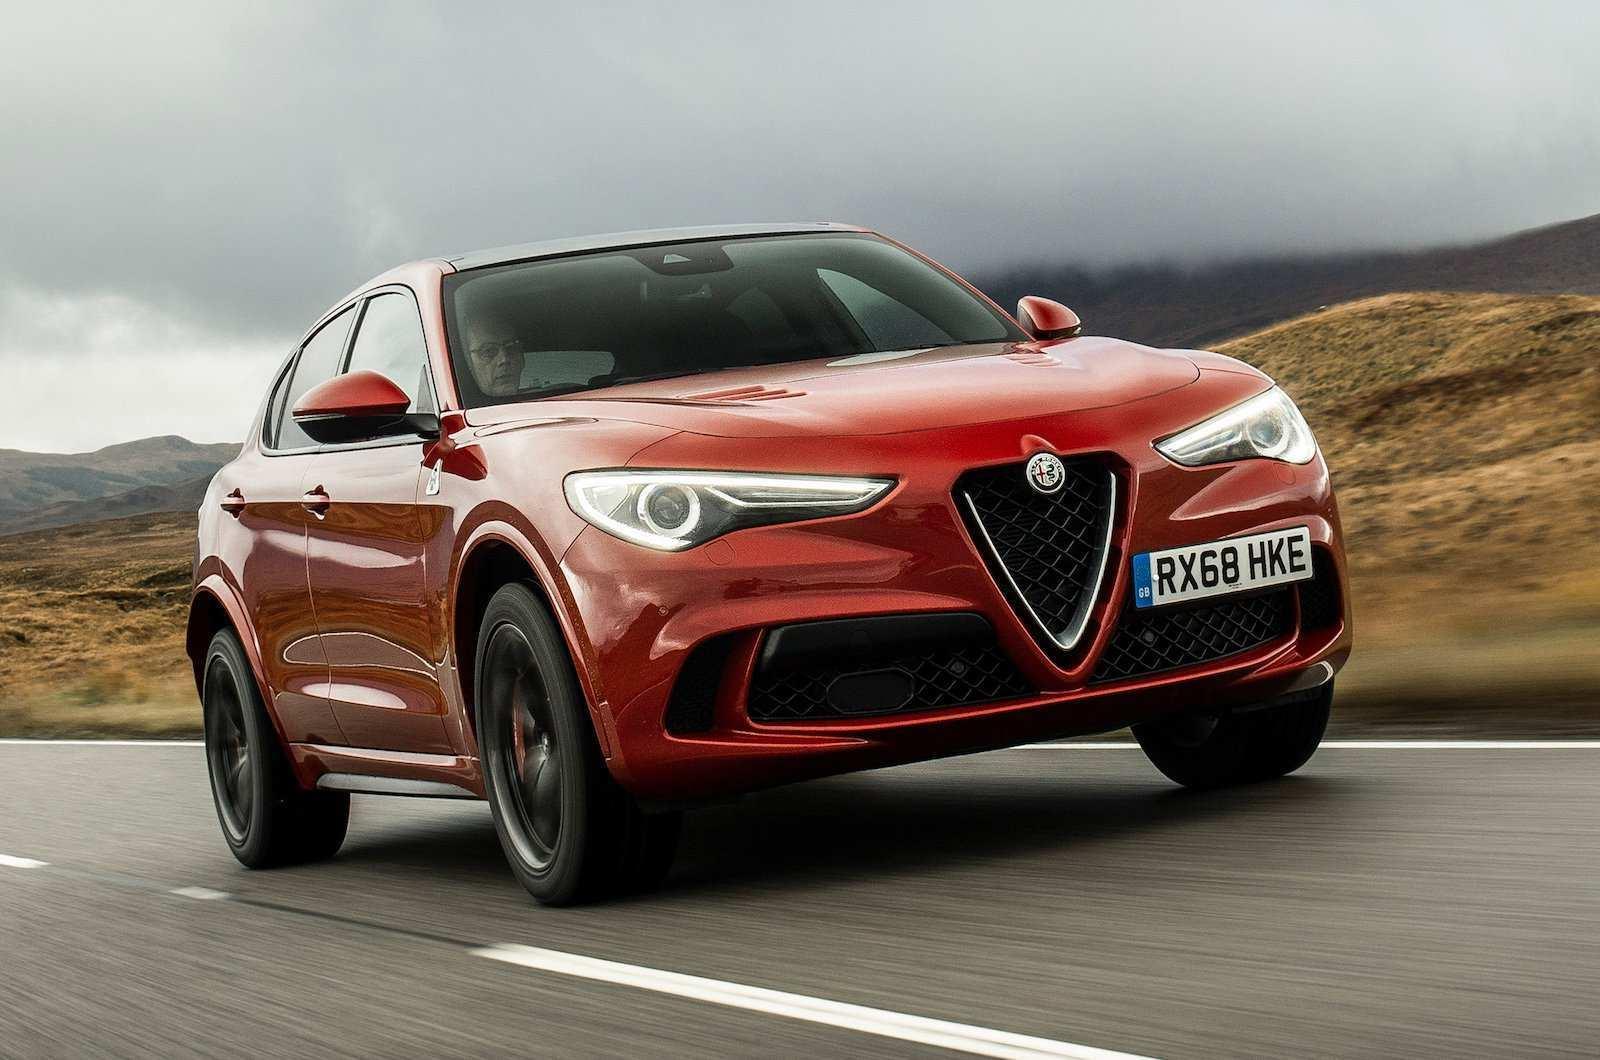 82 Gallery of 2019 Alfa Romeo Stelvio Release Date First Drive by 2019 Alfa Romeo Stelvio Release Date